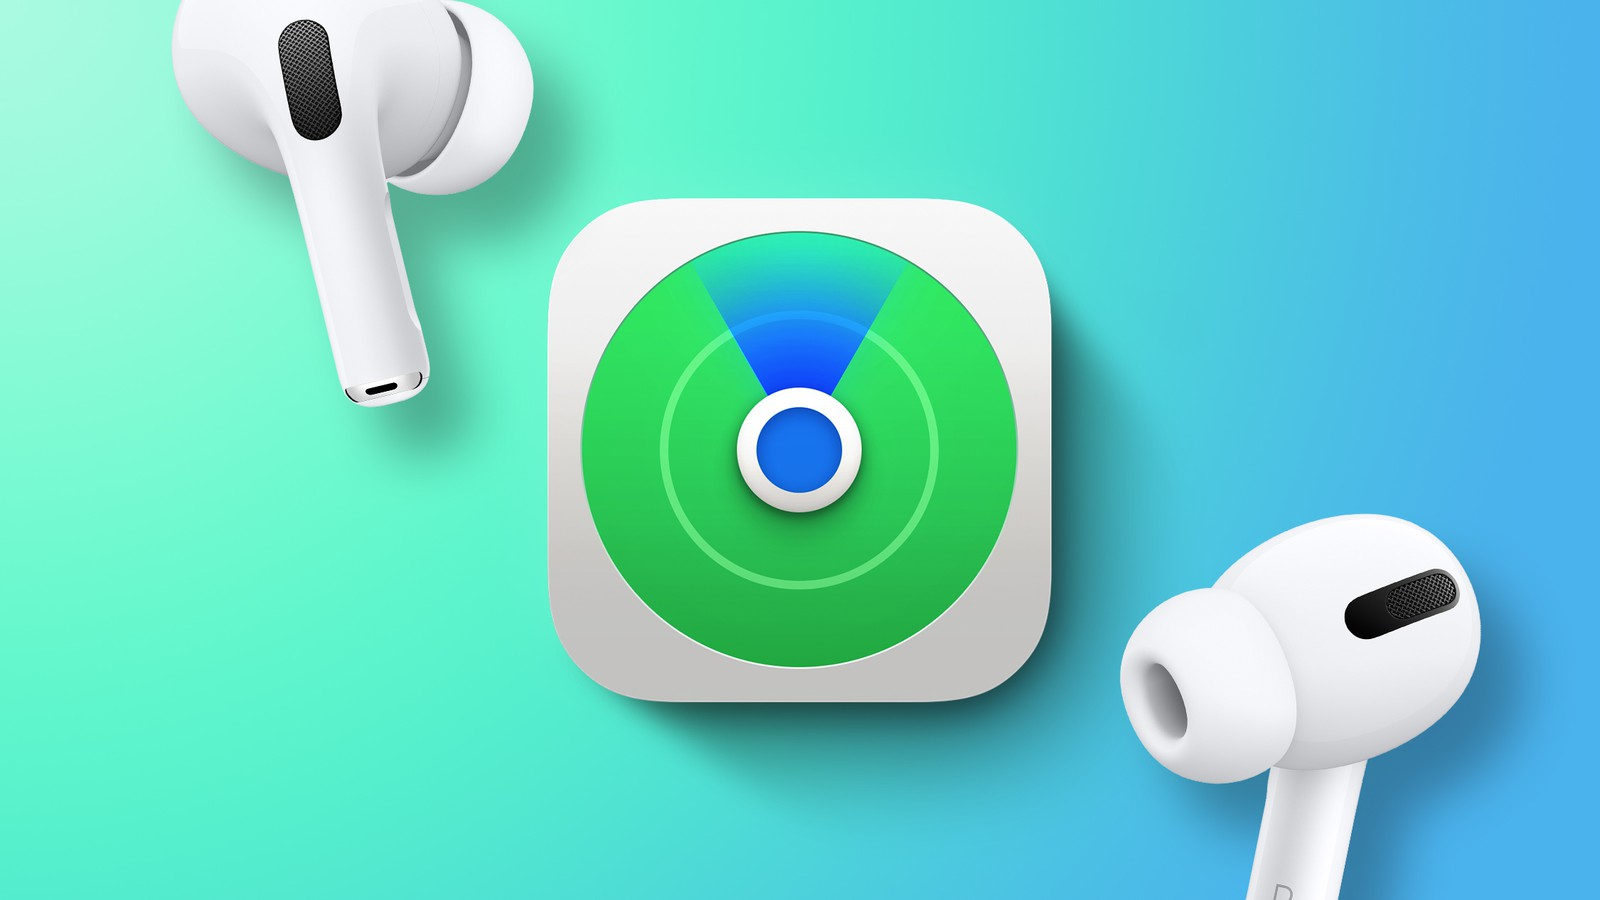 iOS 15 beta 5 新功能:查找网络支持 AirPods Pro 和 AirPods Max